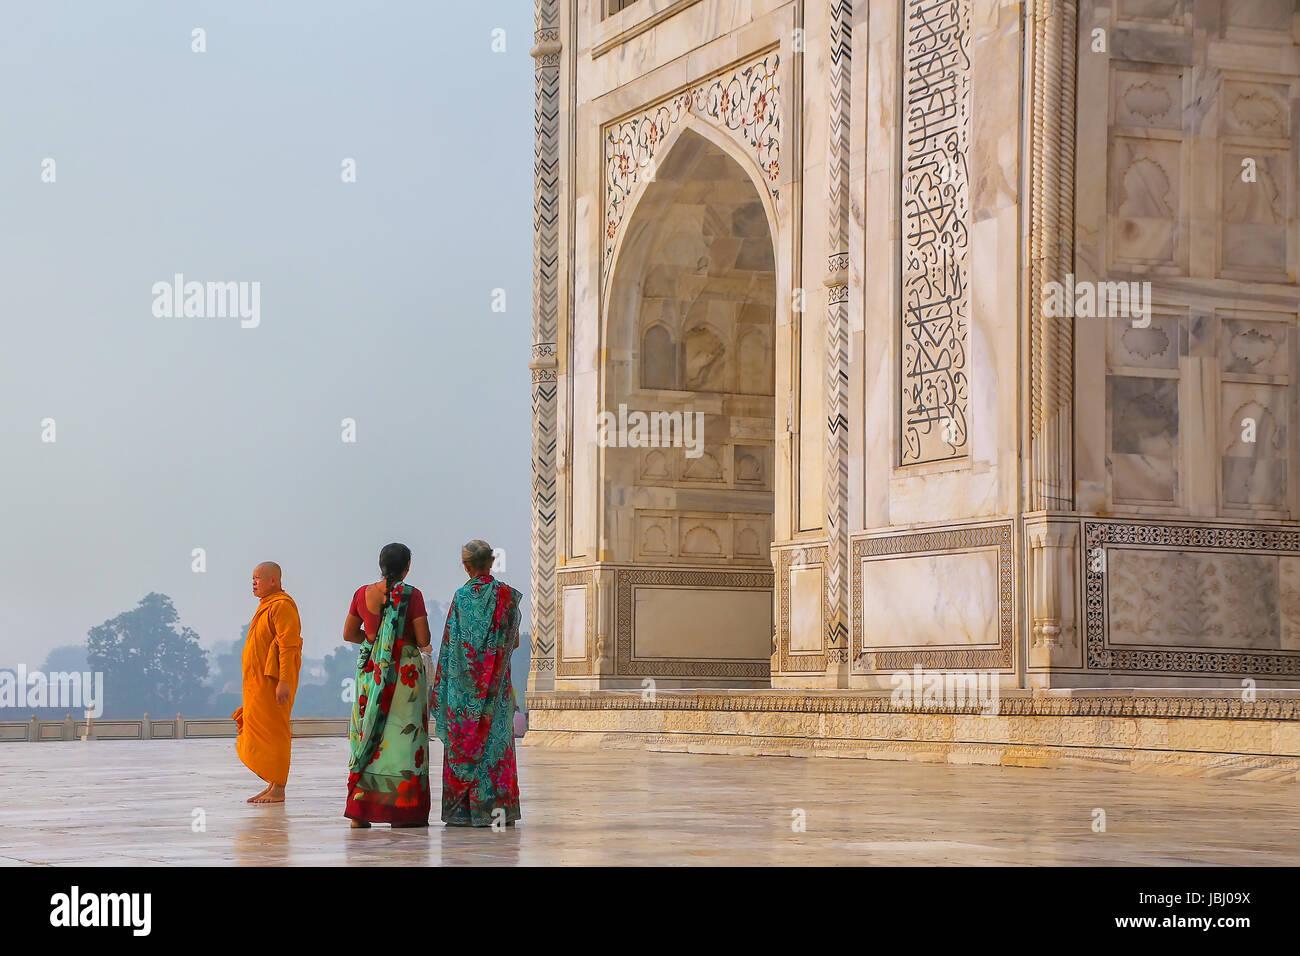 Tourists standing outside Taj Mahal in Agra, Uttar Pradesh, India. Taj Mahal was designated as a UNESCO World Heritage - Stock Image